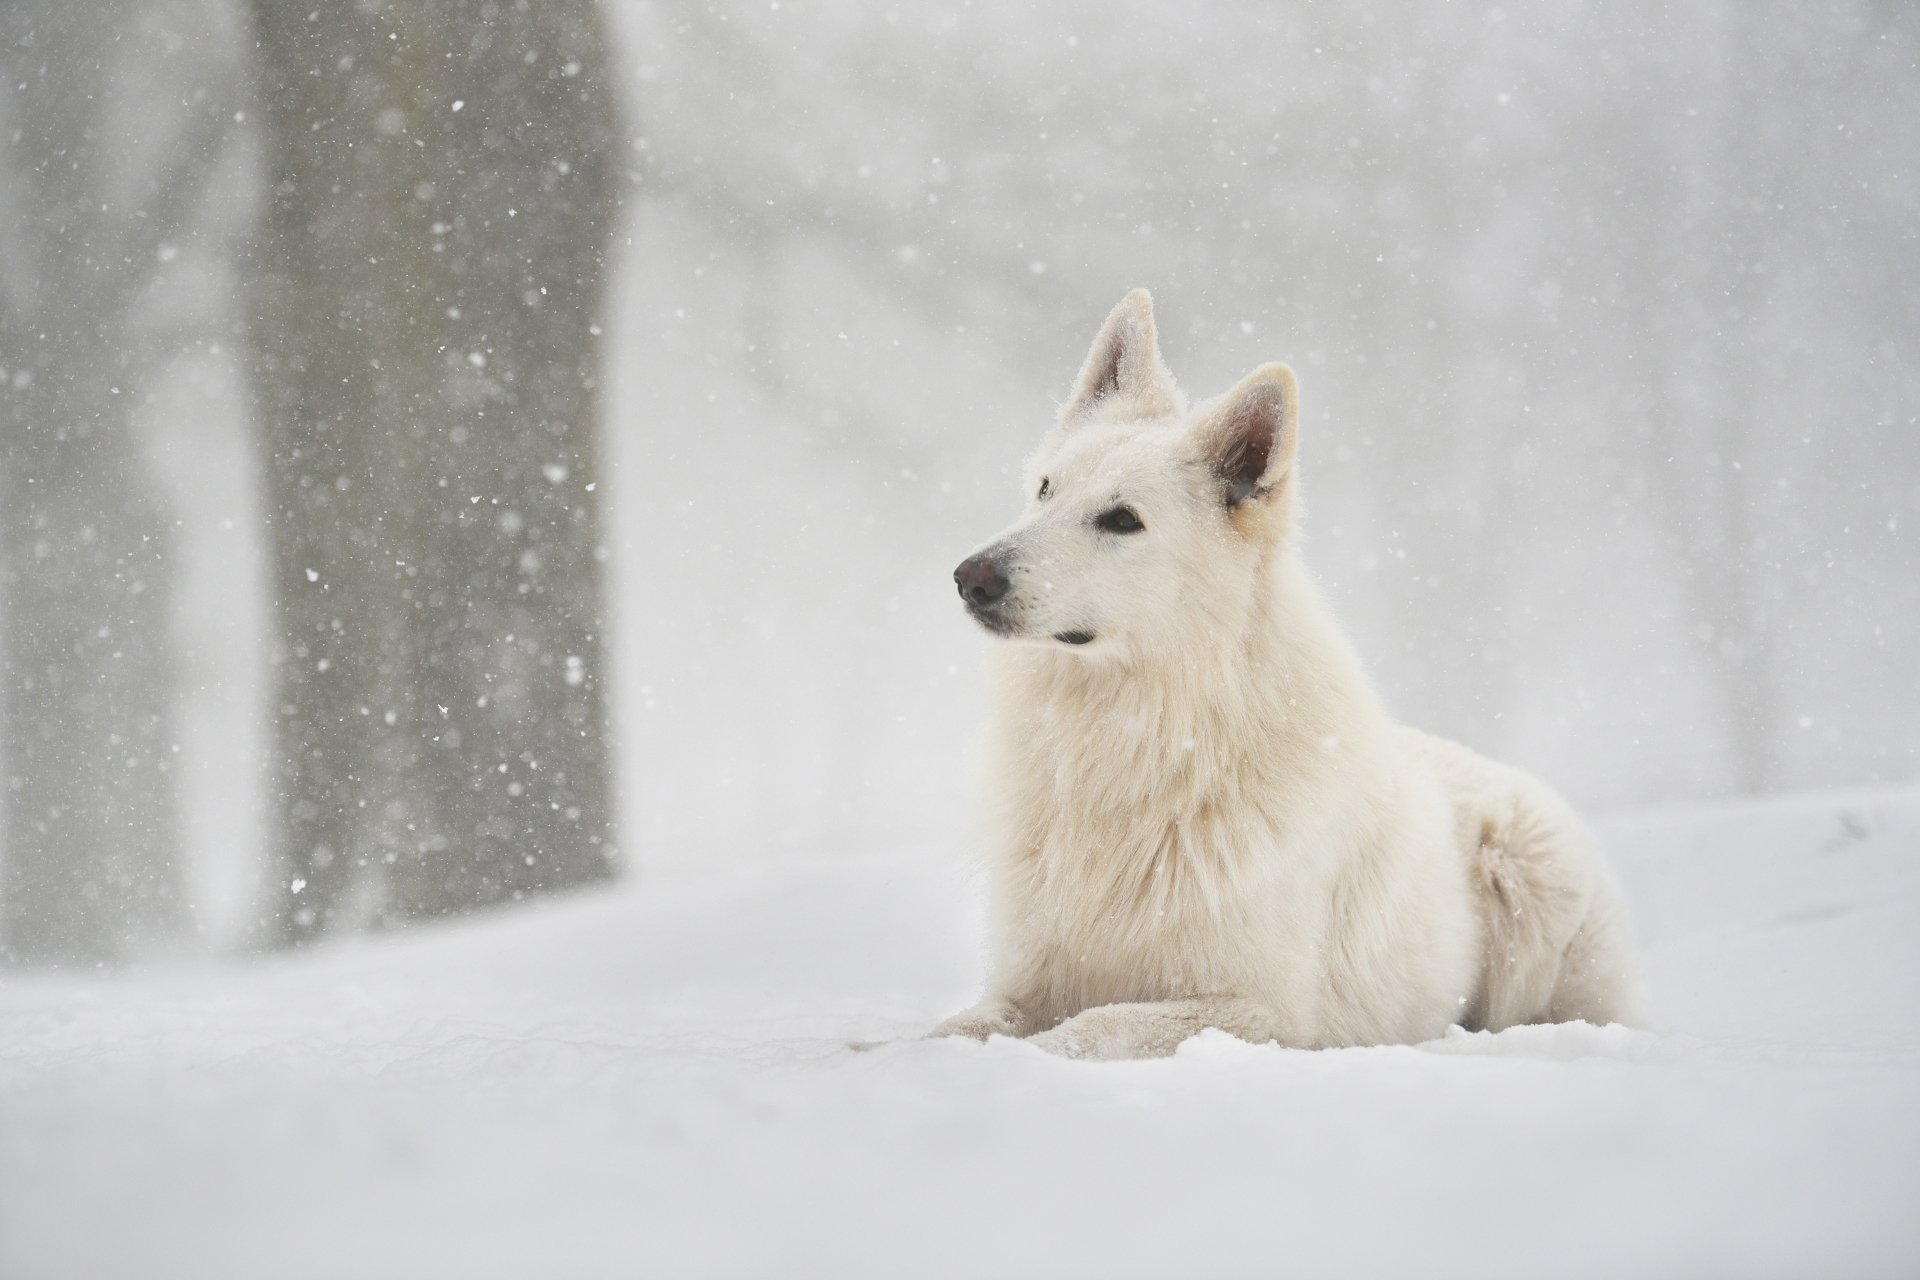 snowfall on Berger Blanc Suisse image